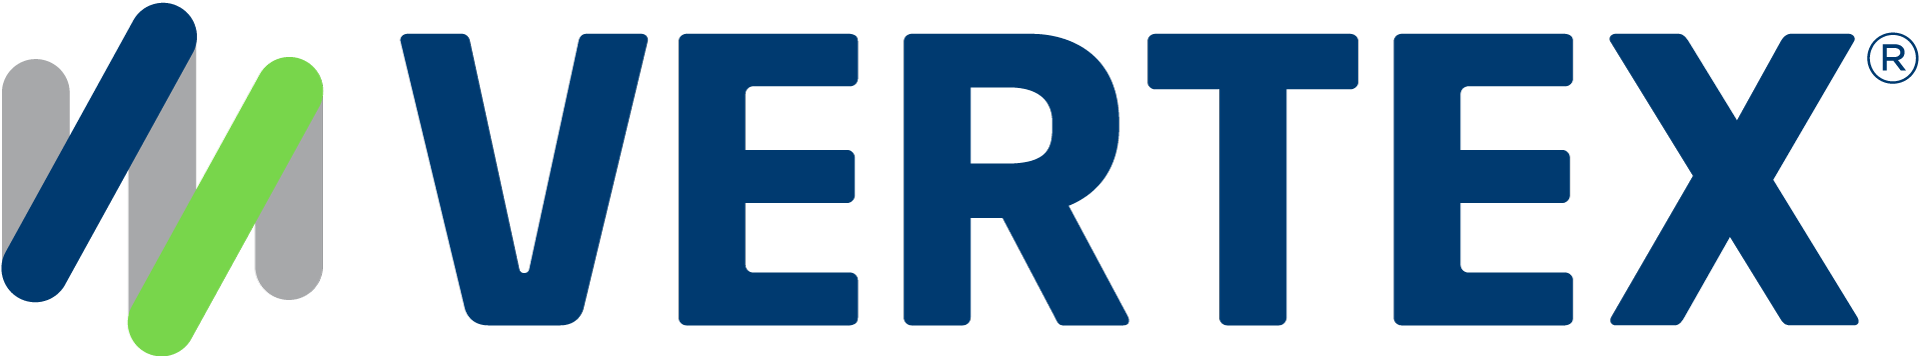 Vertex Inc.